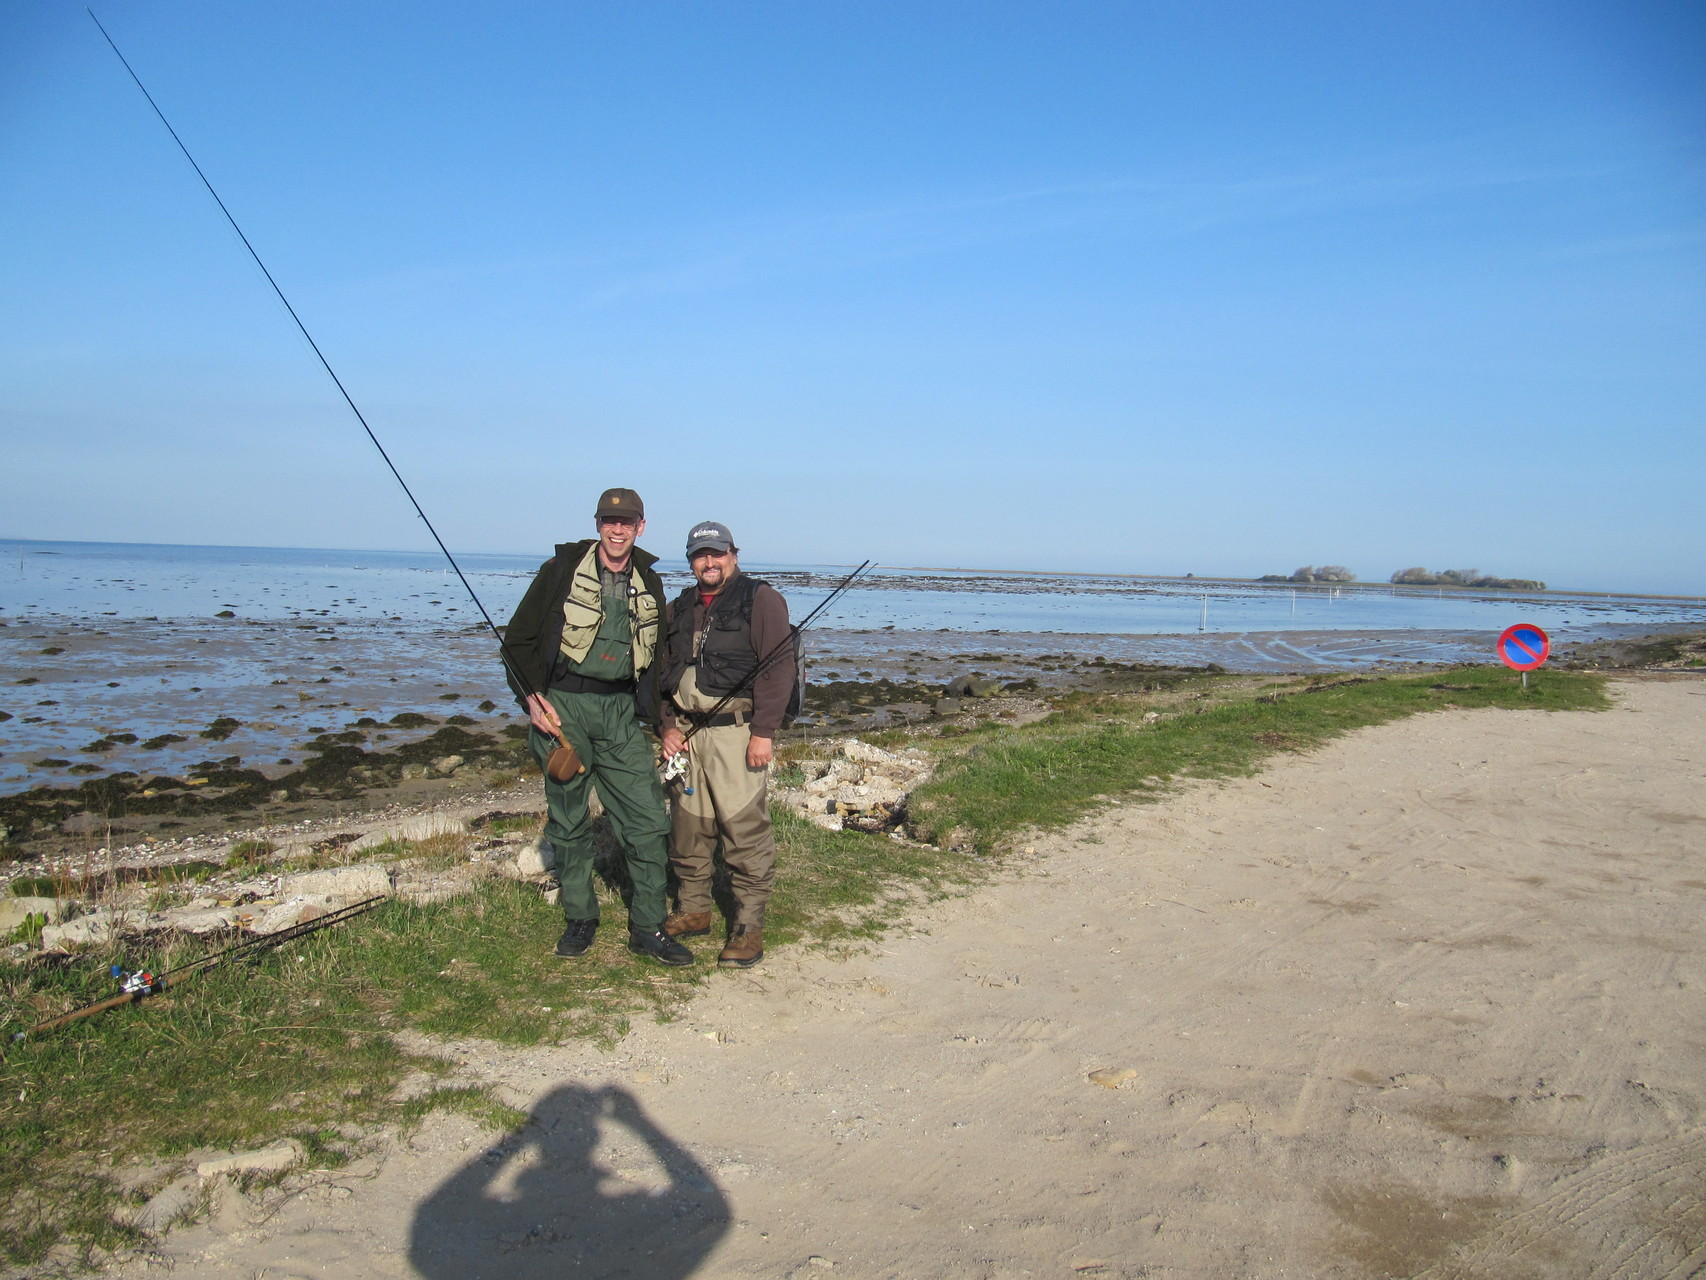 Stefan & Micha am Ebbevey nach Aebeloe